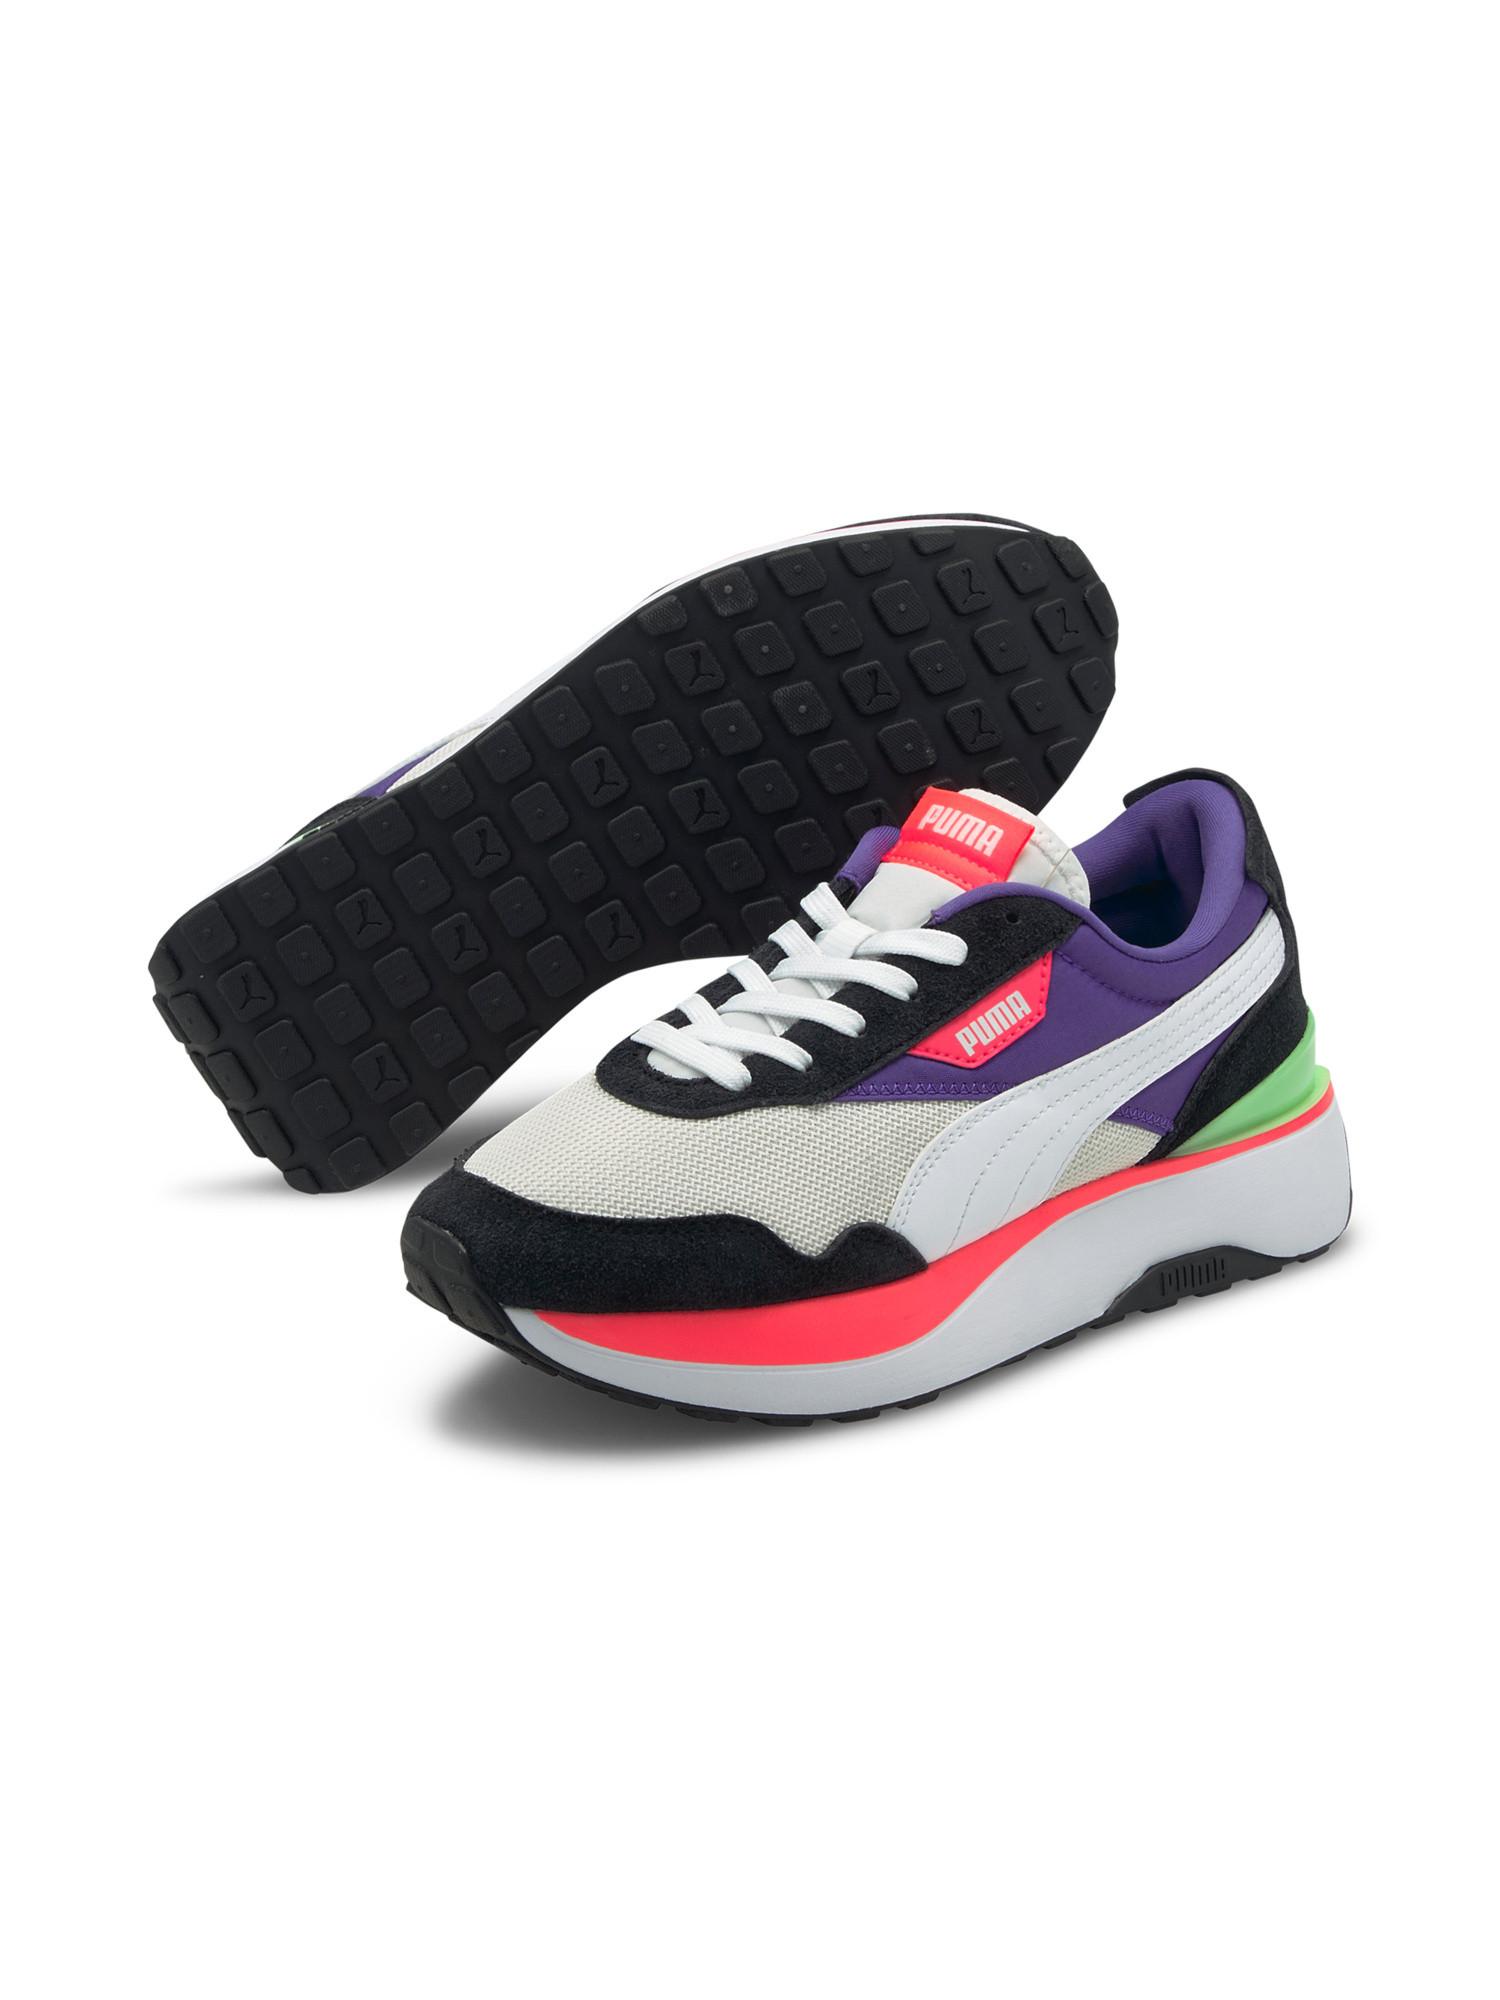 Sneakers Oslo Maya, Multicolor, large image number 4